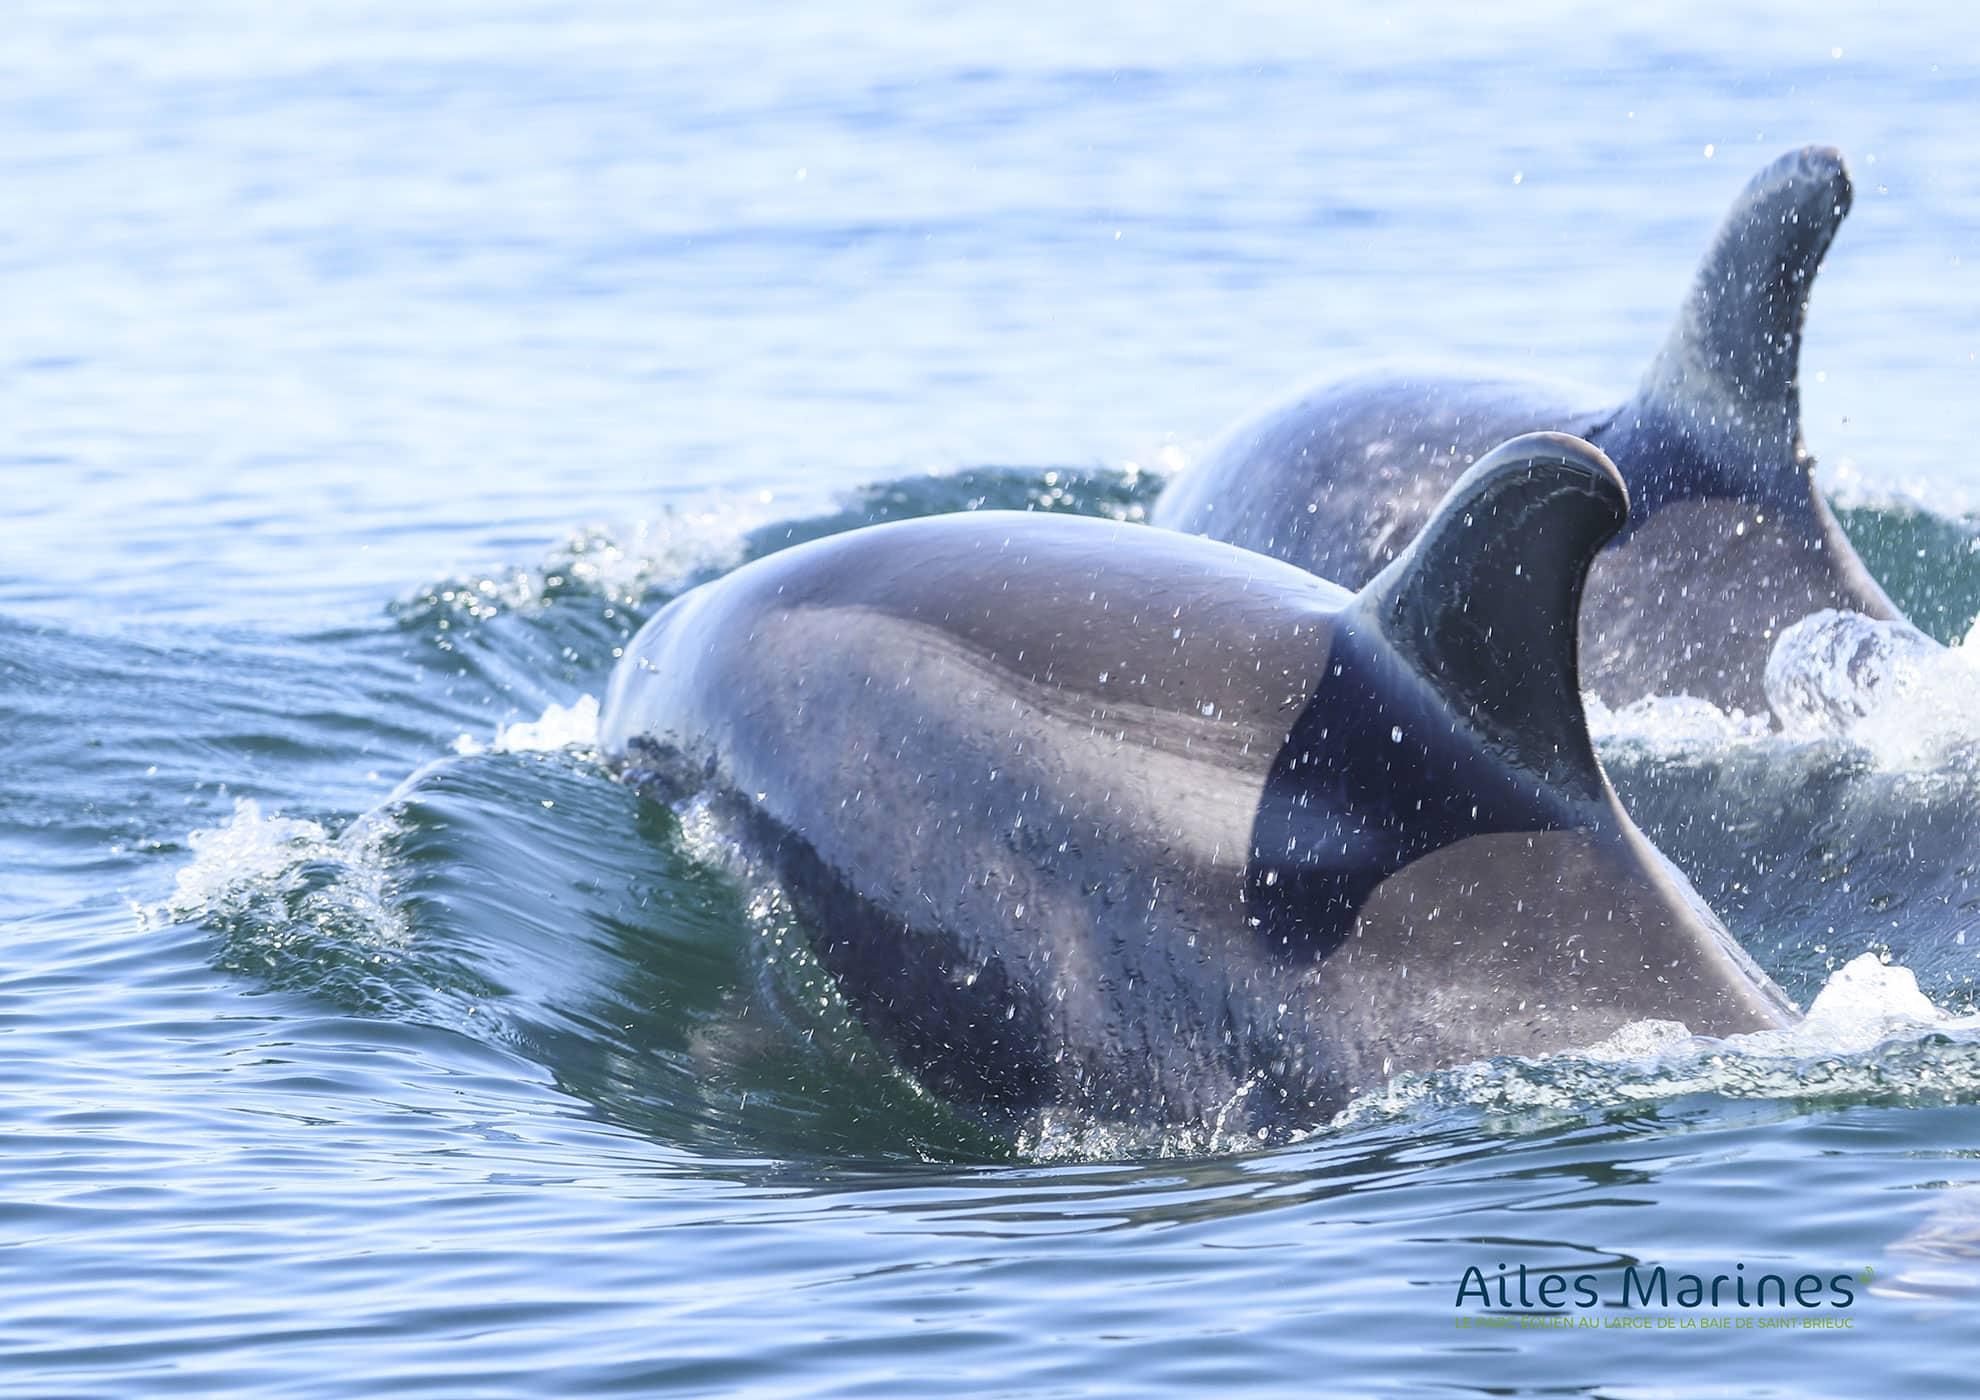 ailes-marines-deux-dauphins